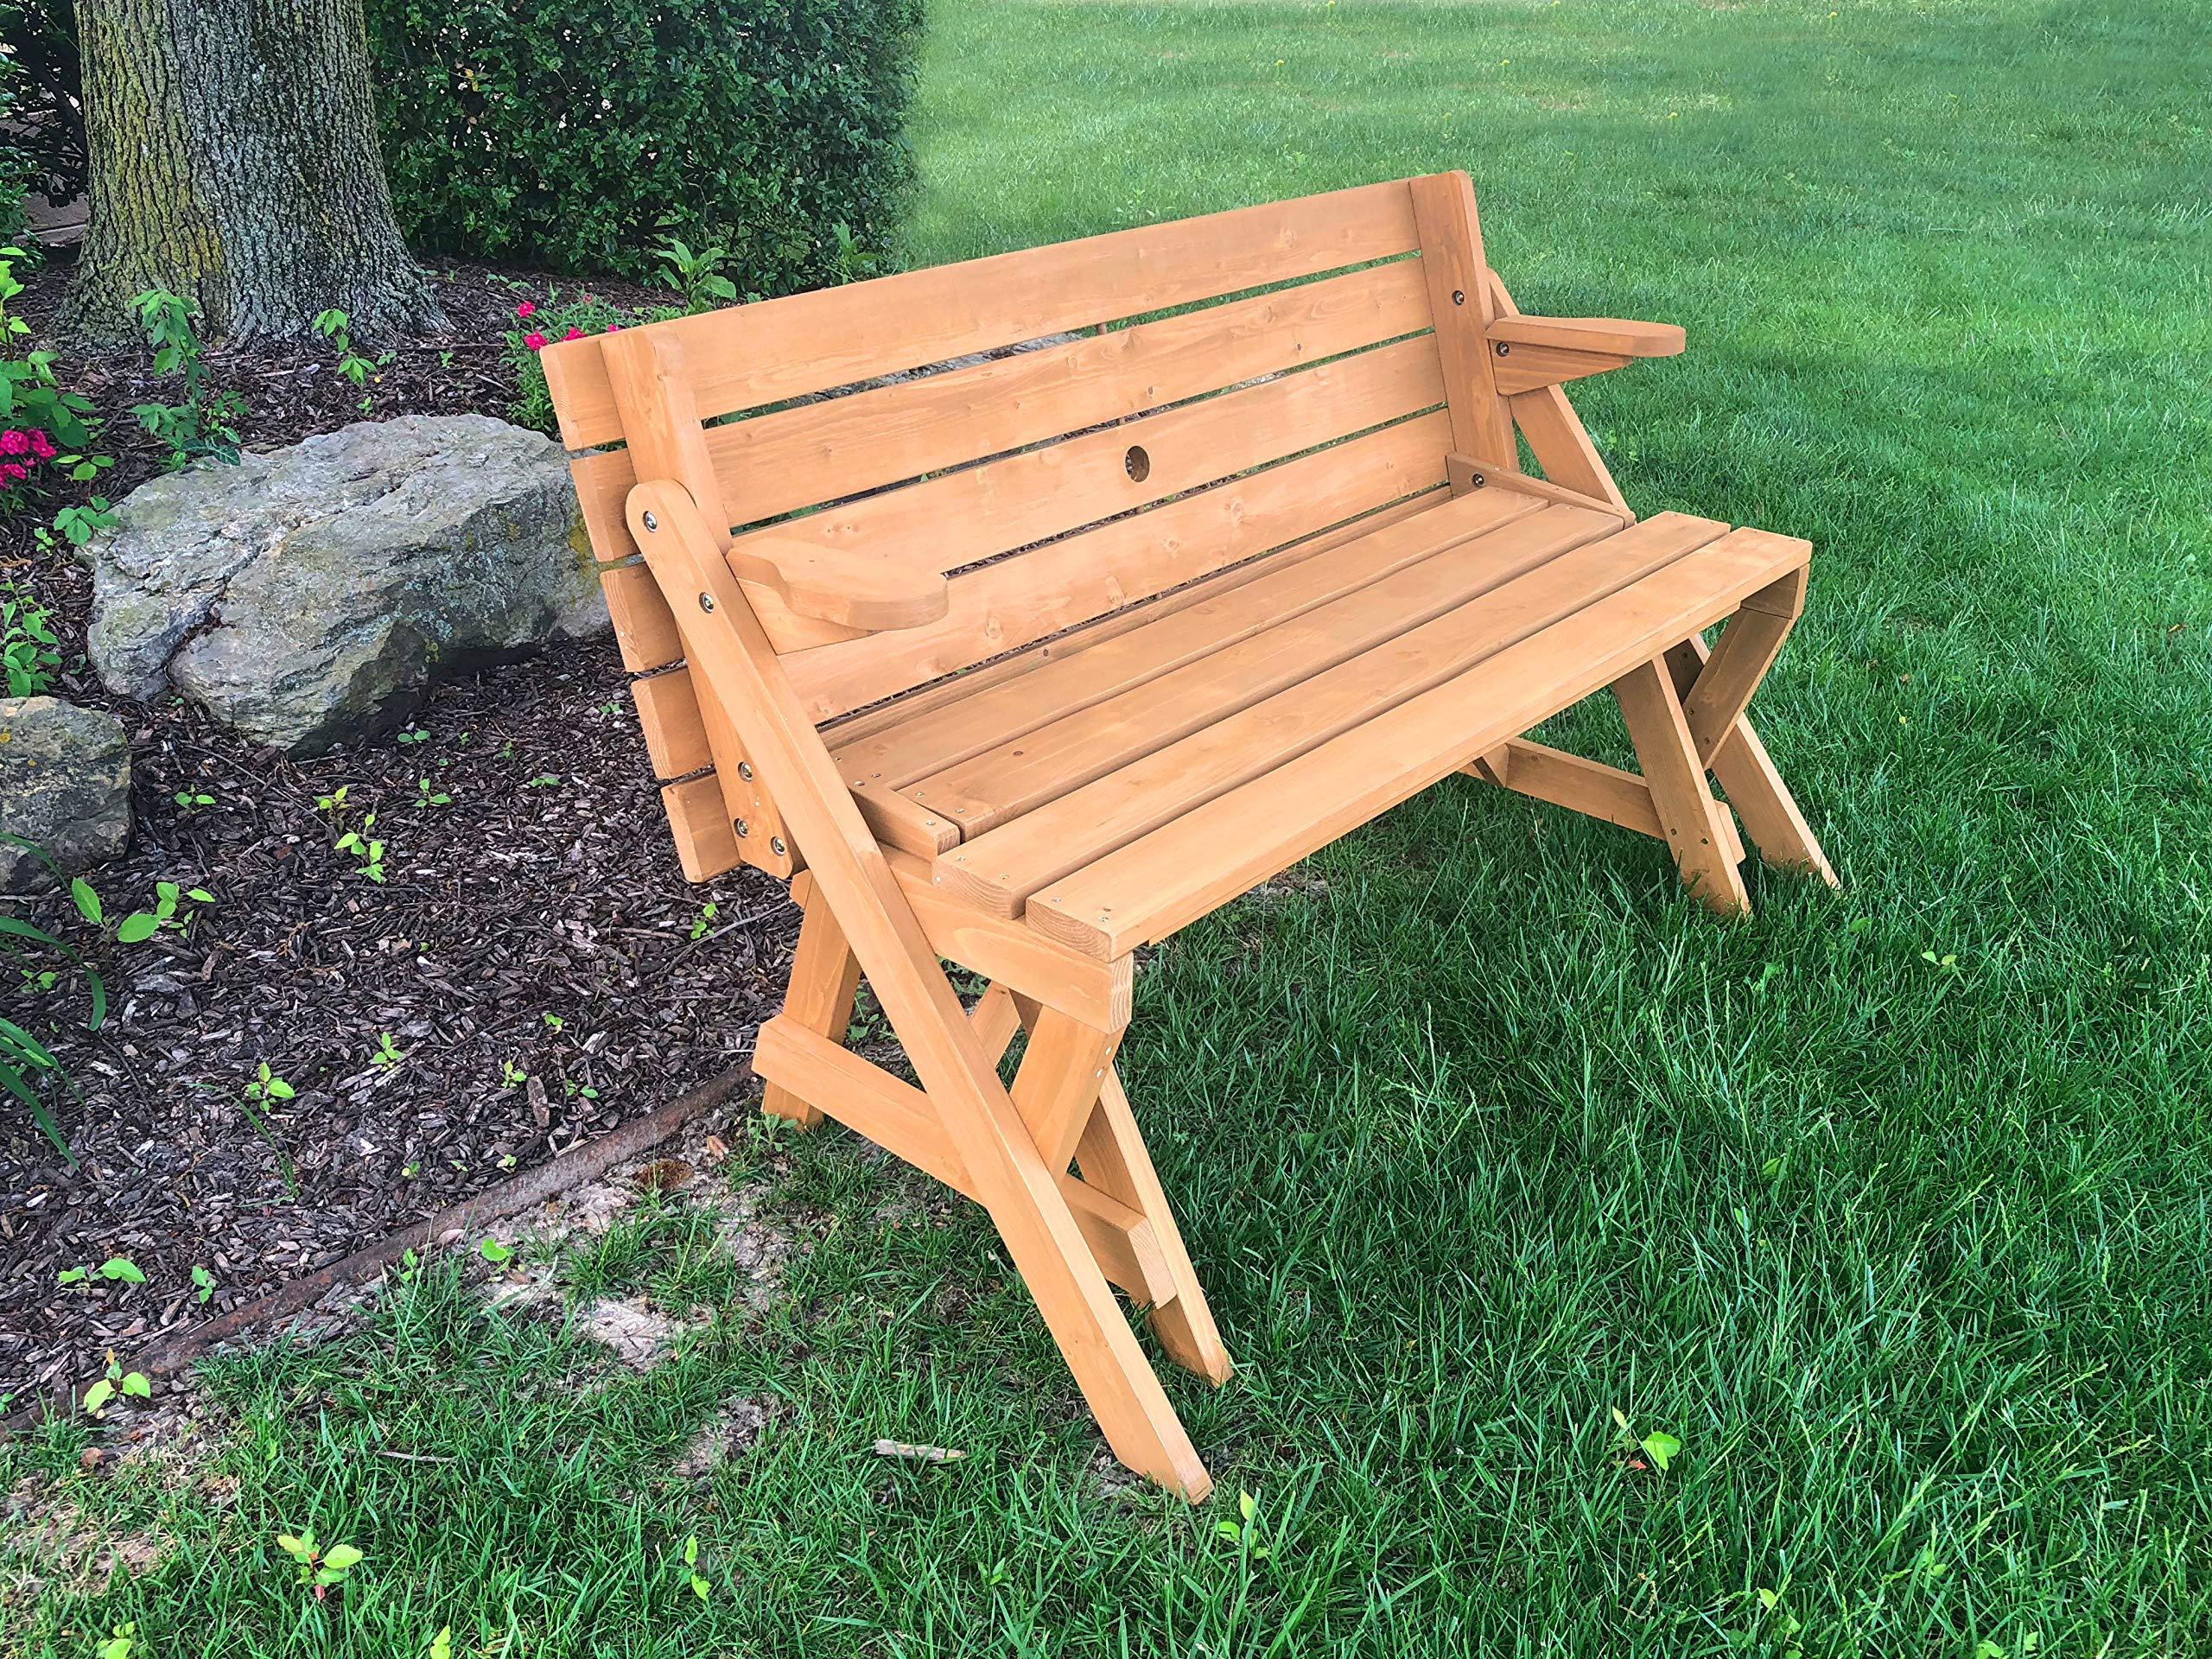 Tierra Garden 2-in-1 Convertible Junior Picnic Table/Bench by Tierra Garden (Image #5)